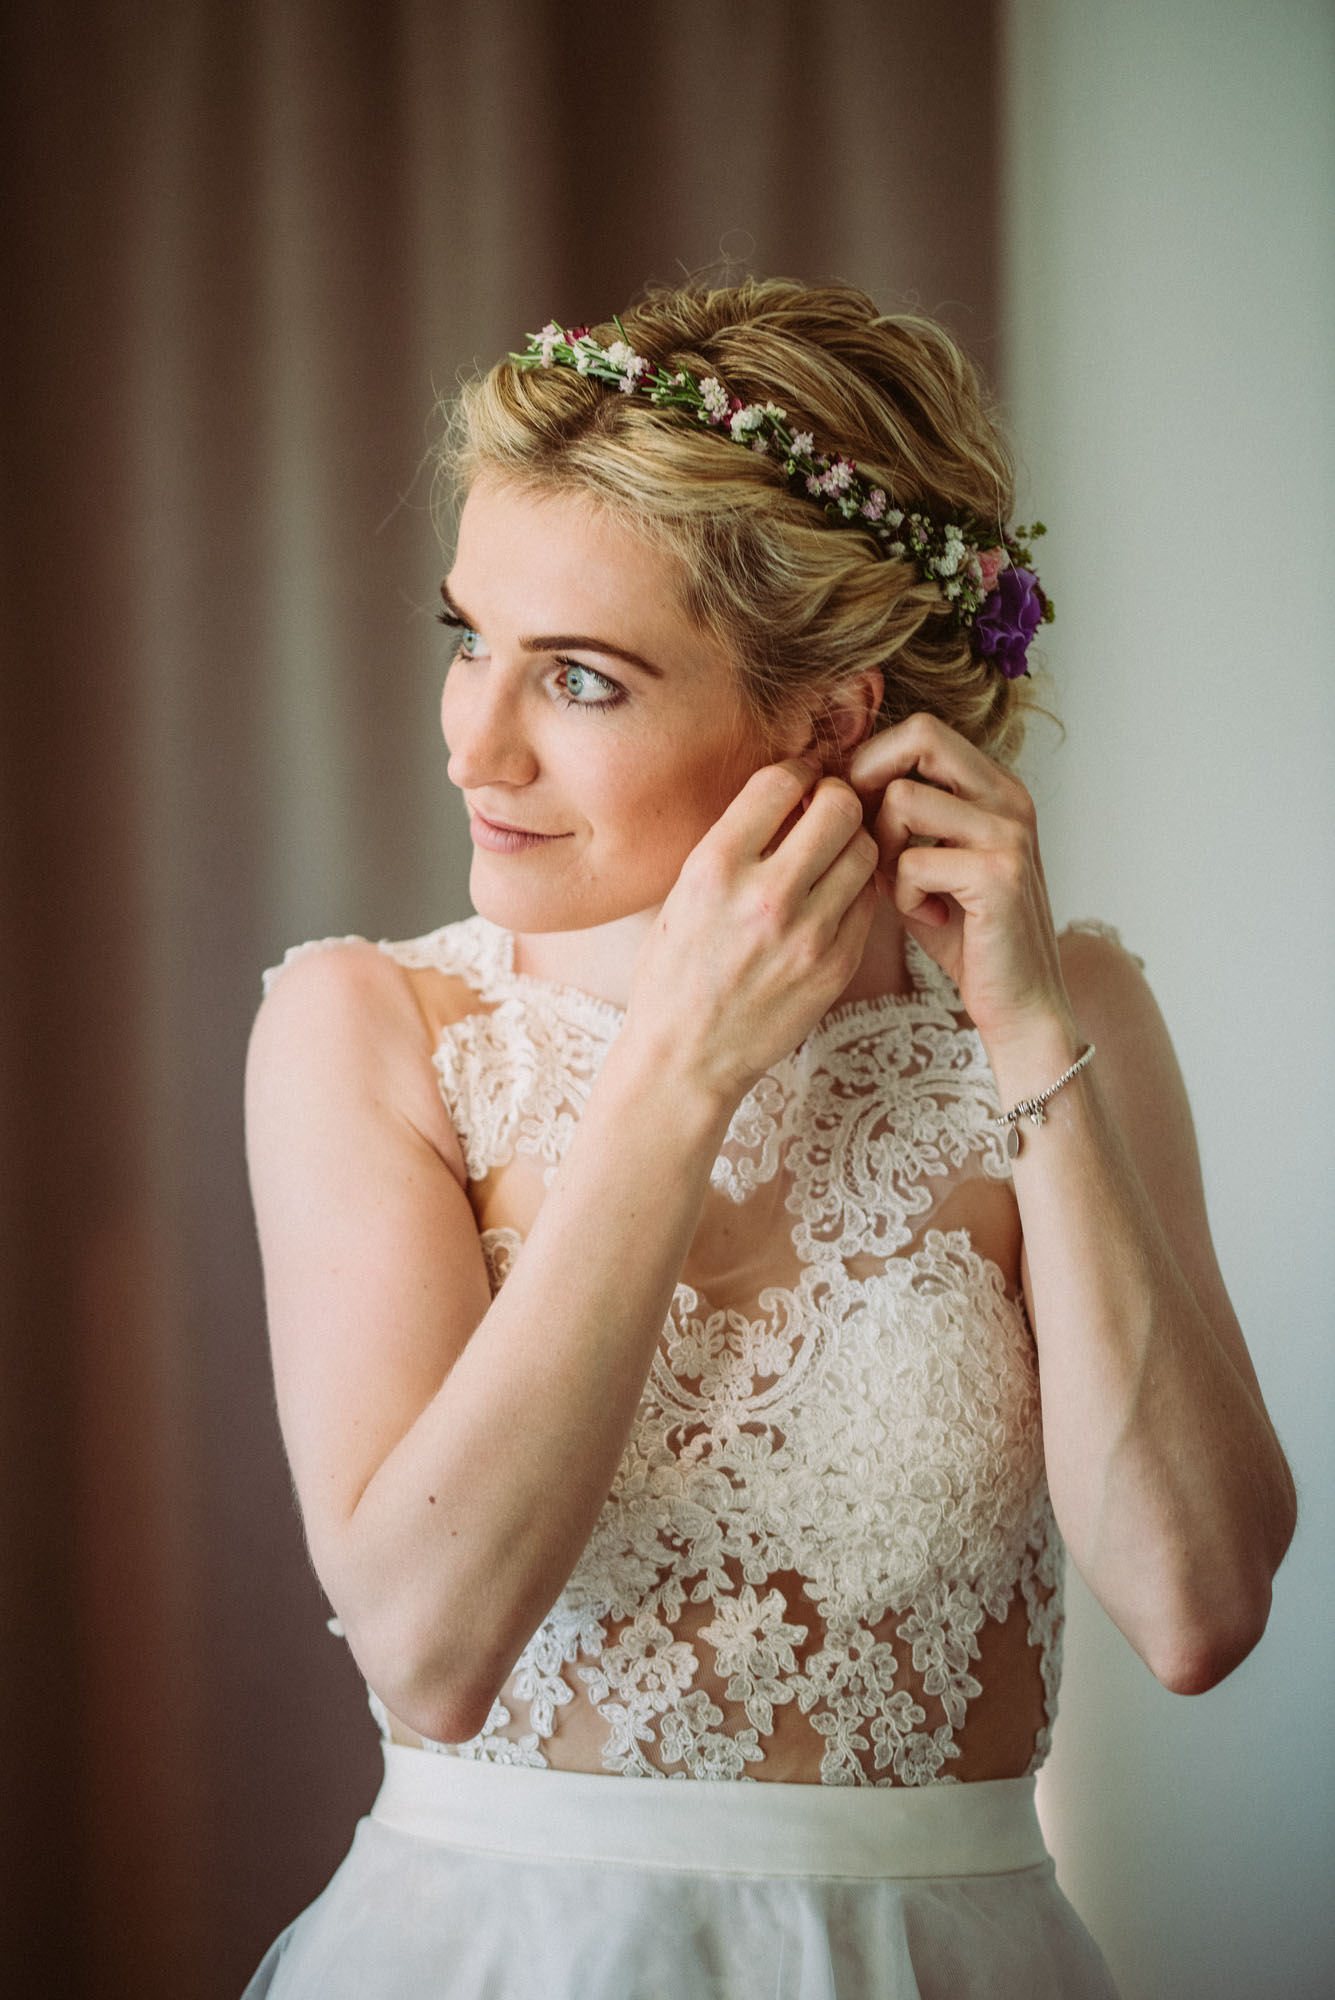 Hochzeitsfotografin Nadia Jabli